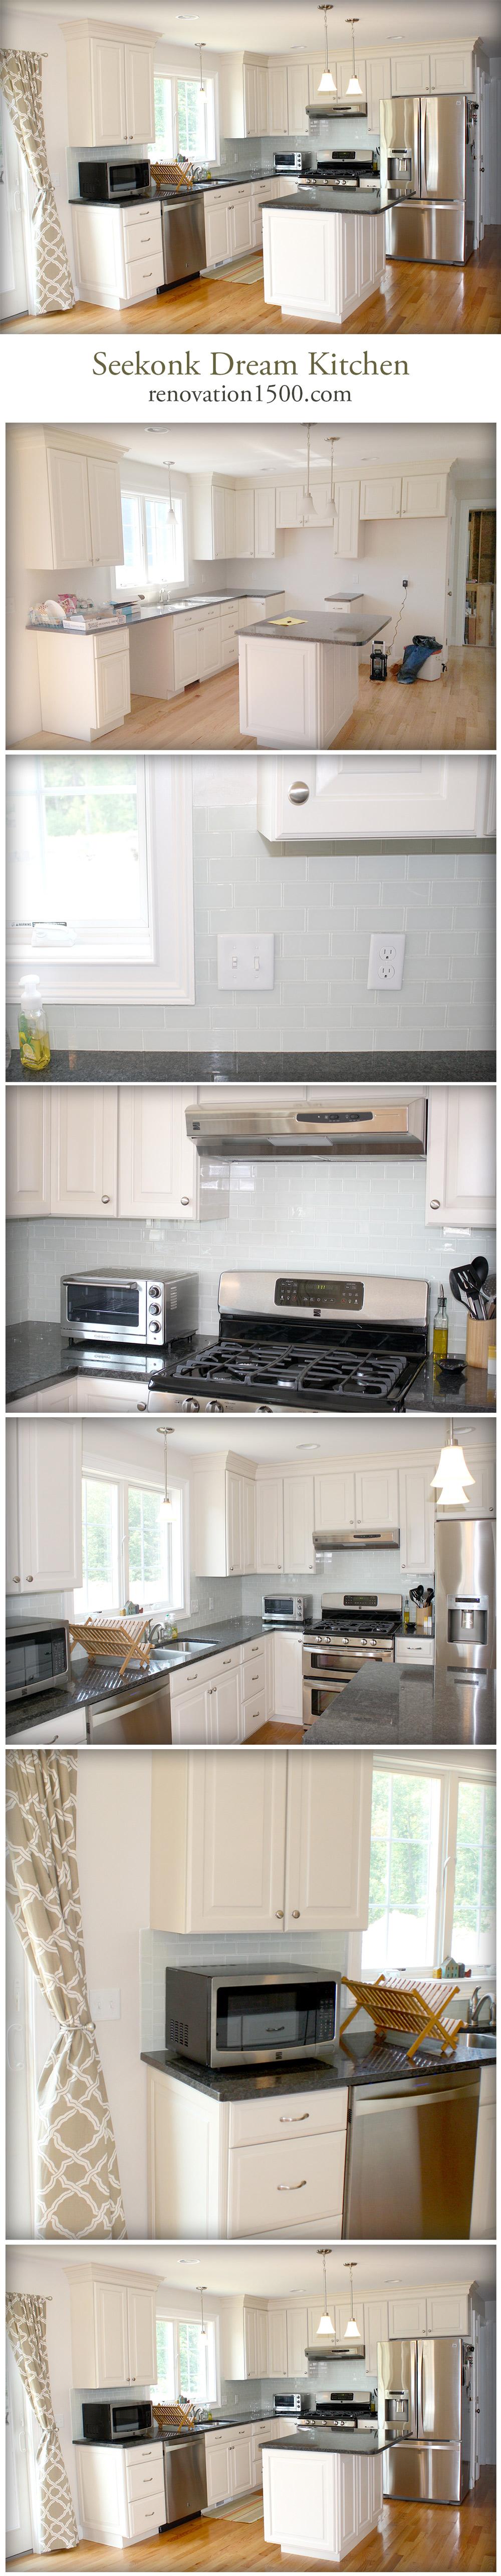 Seekonk Dream Kitchen Dream Kitchen Kitchen Kitchen Renovation